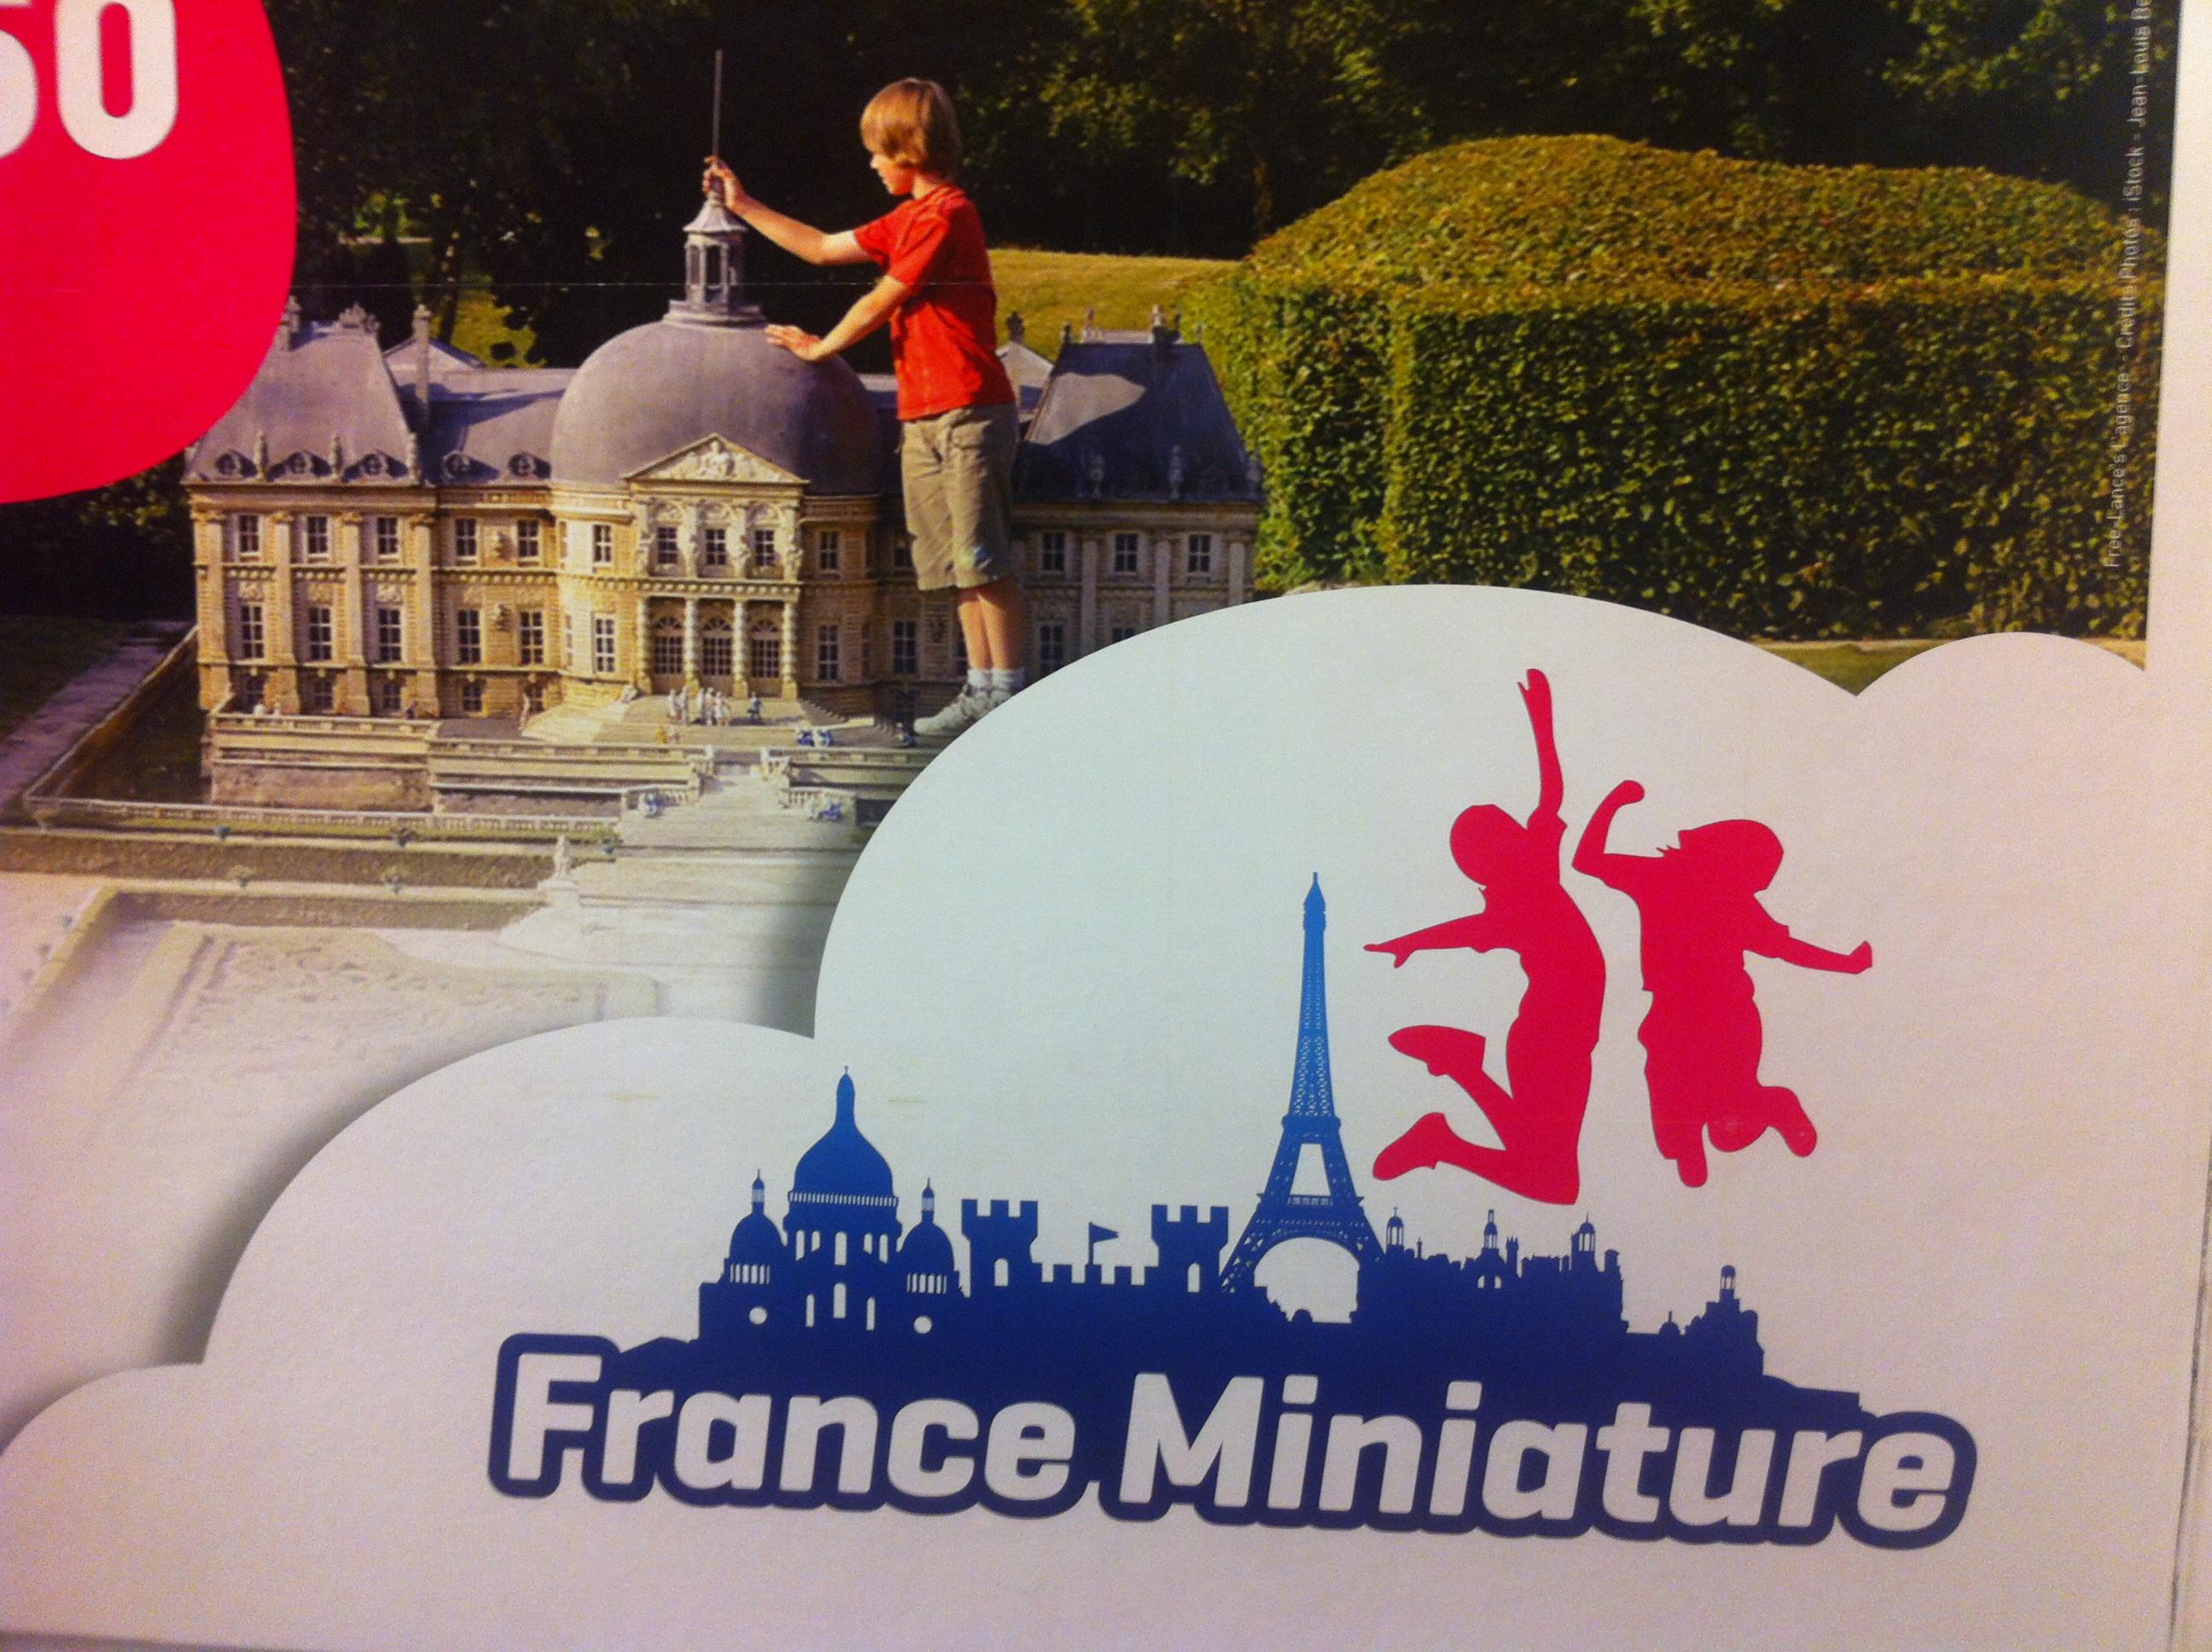 2012-09-05-FranceMiniature.JPG